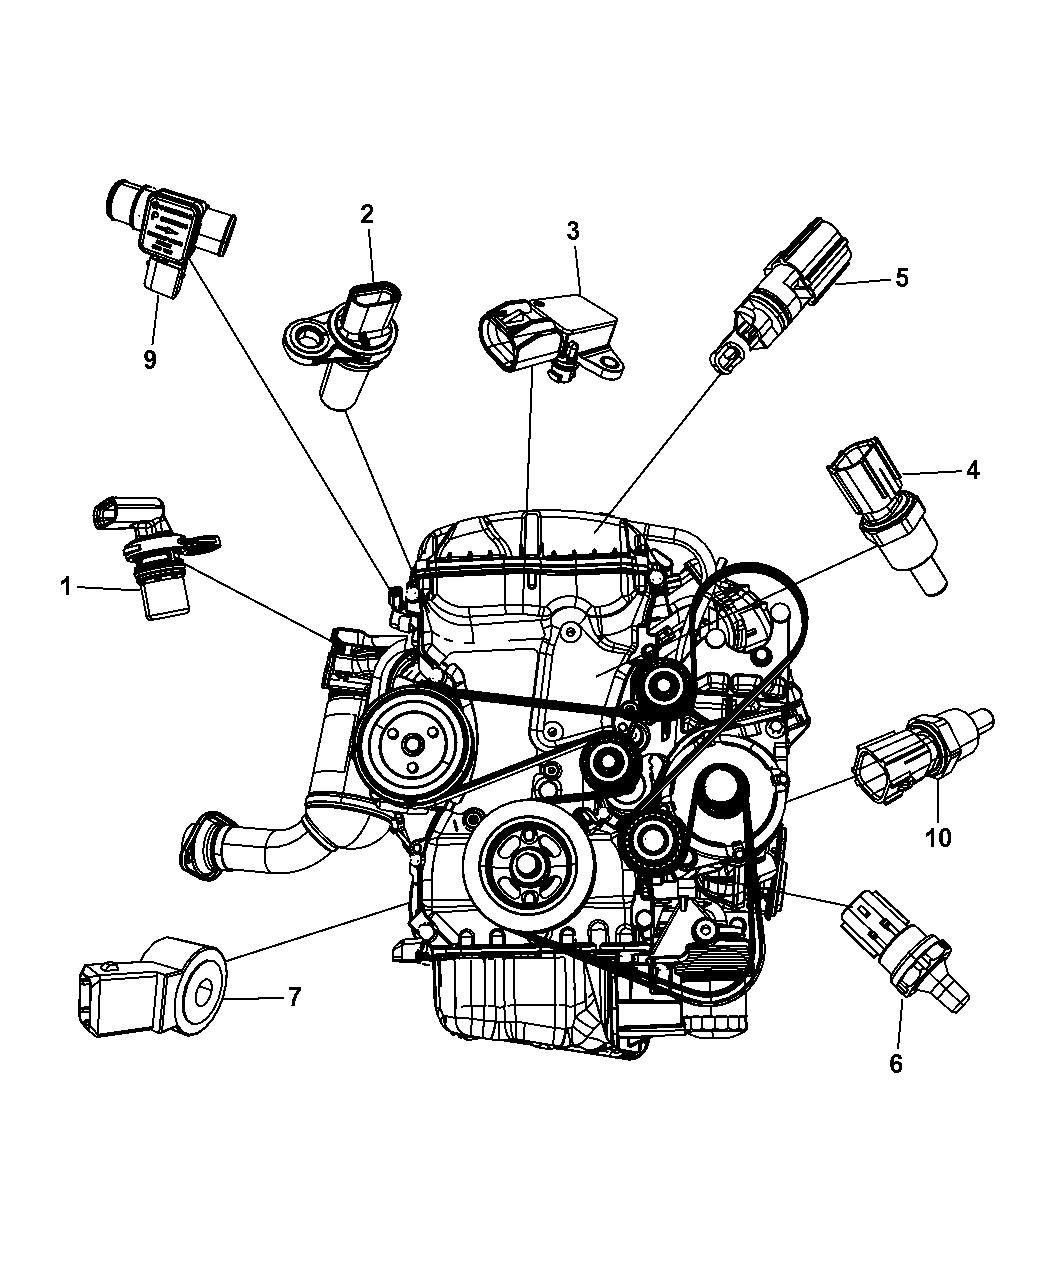 2013 Chrysler 200 Serpentine Belt Diagram